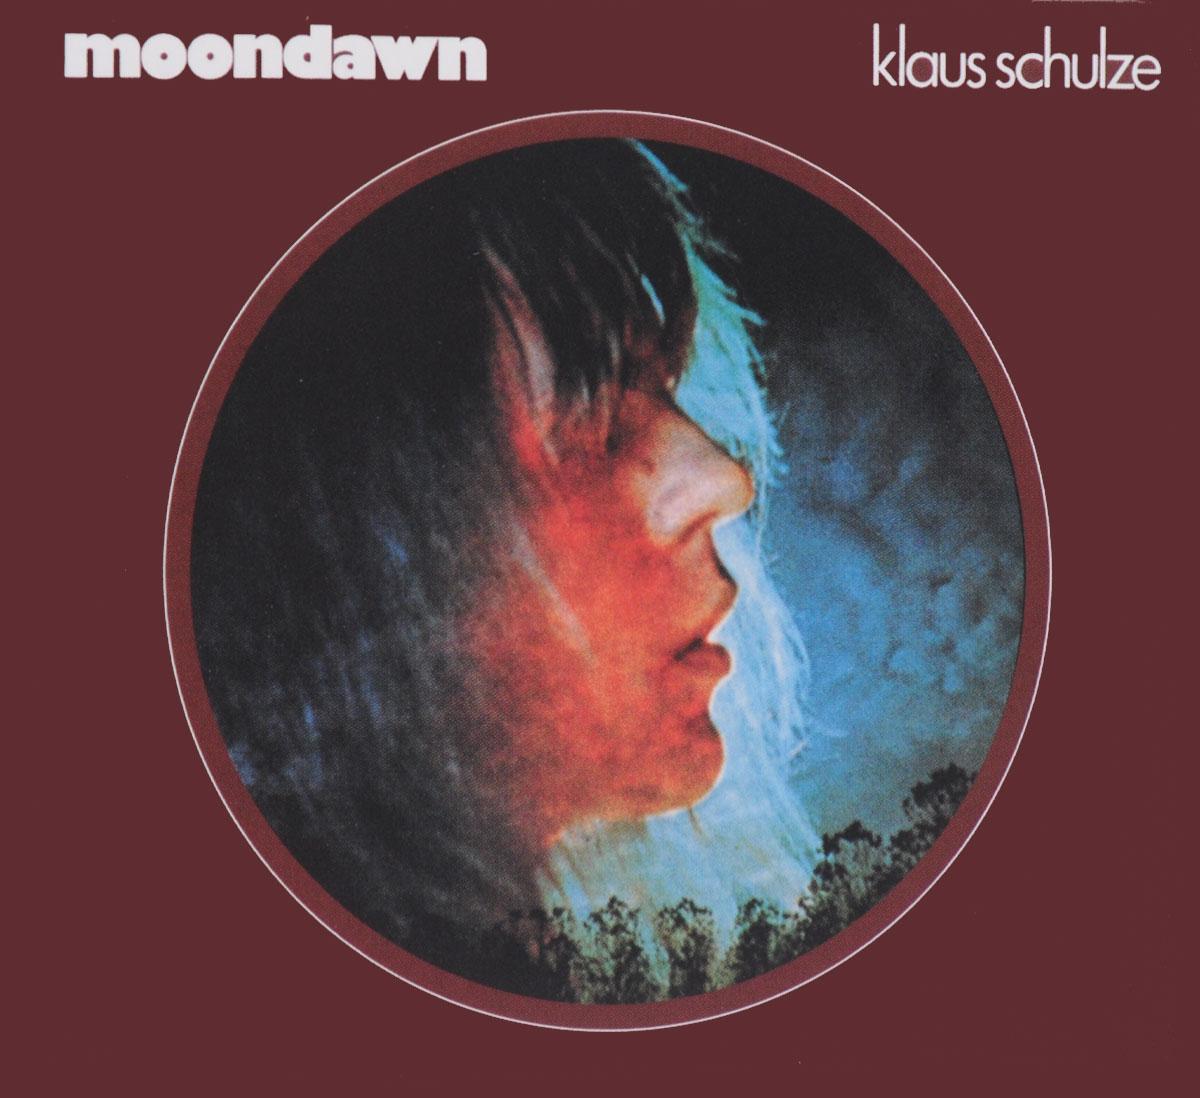 Klaus Schulze. Moondawn 2016 Audio CD